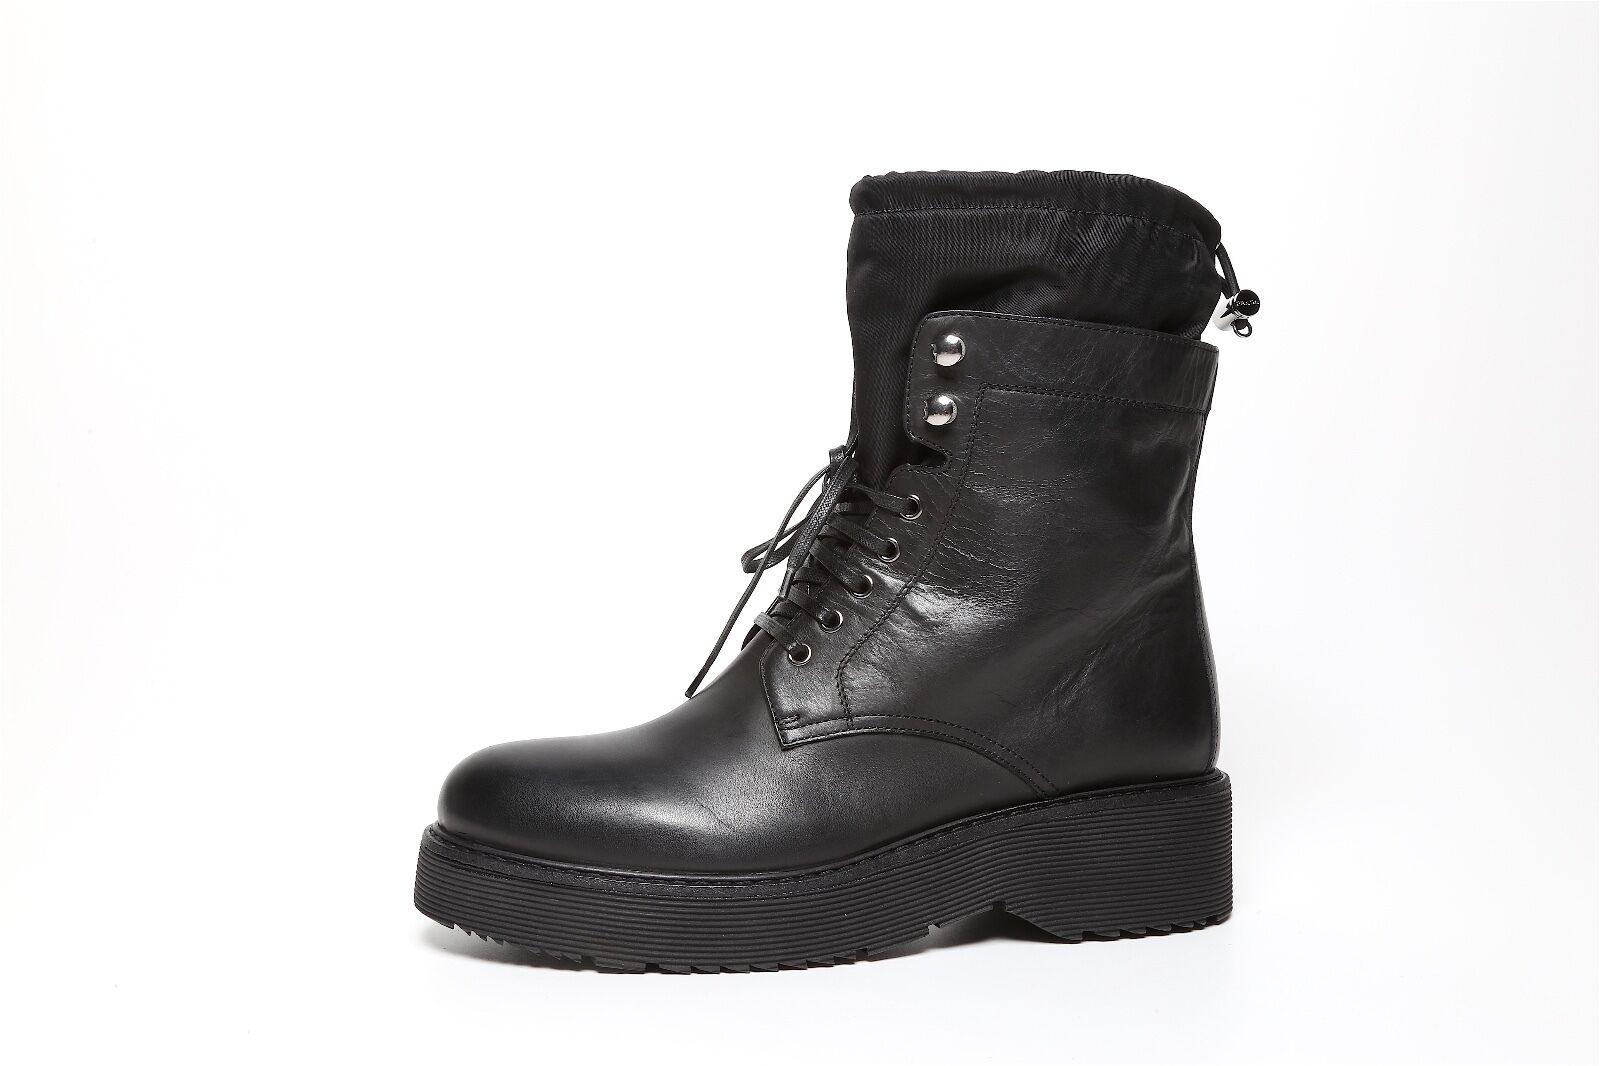 Prada Prada Prada 3T6101 Women's Black Leather Military Boots 6196 Sz 40 EUR 9f8e03